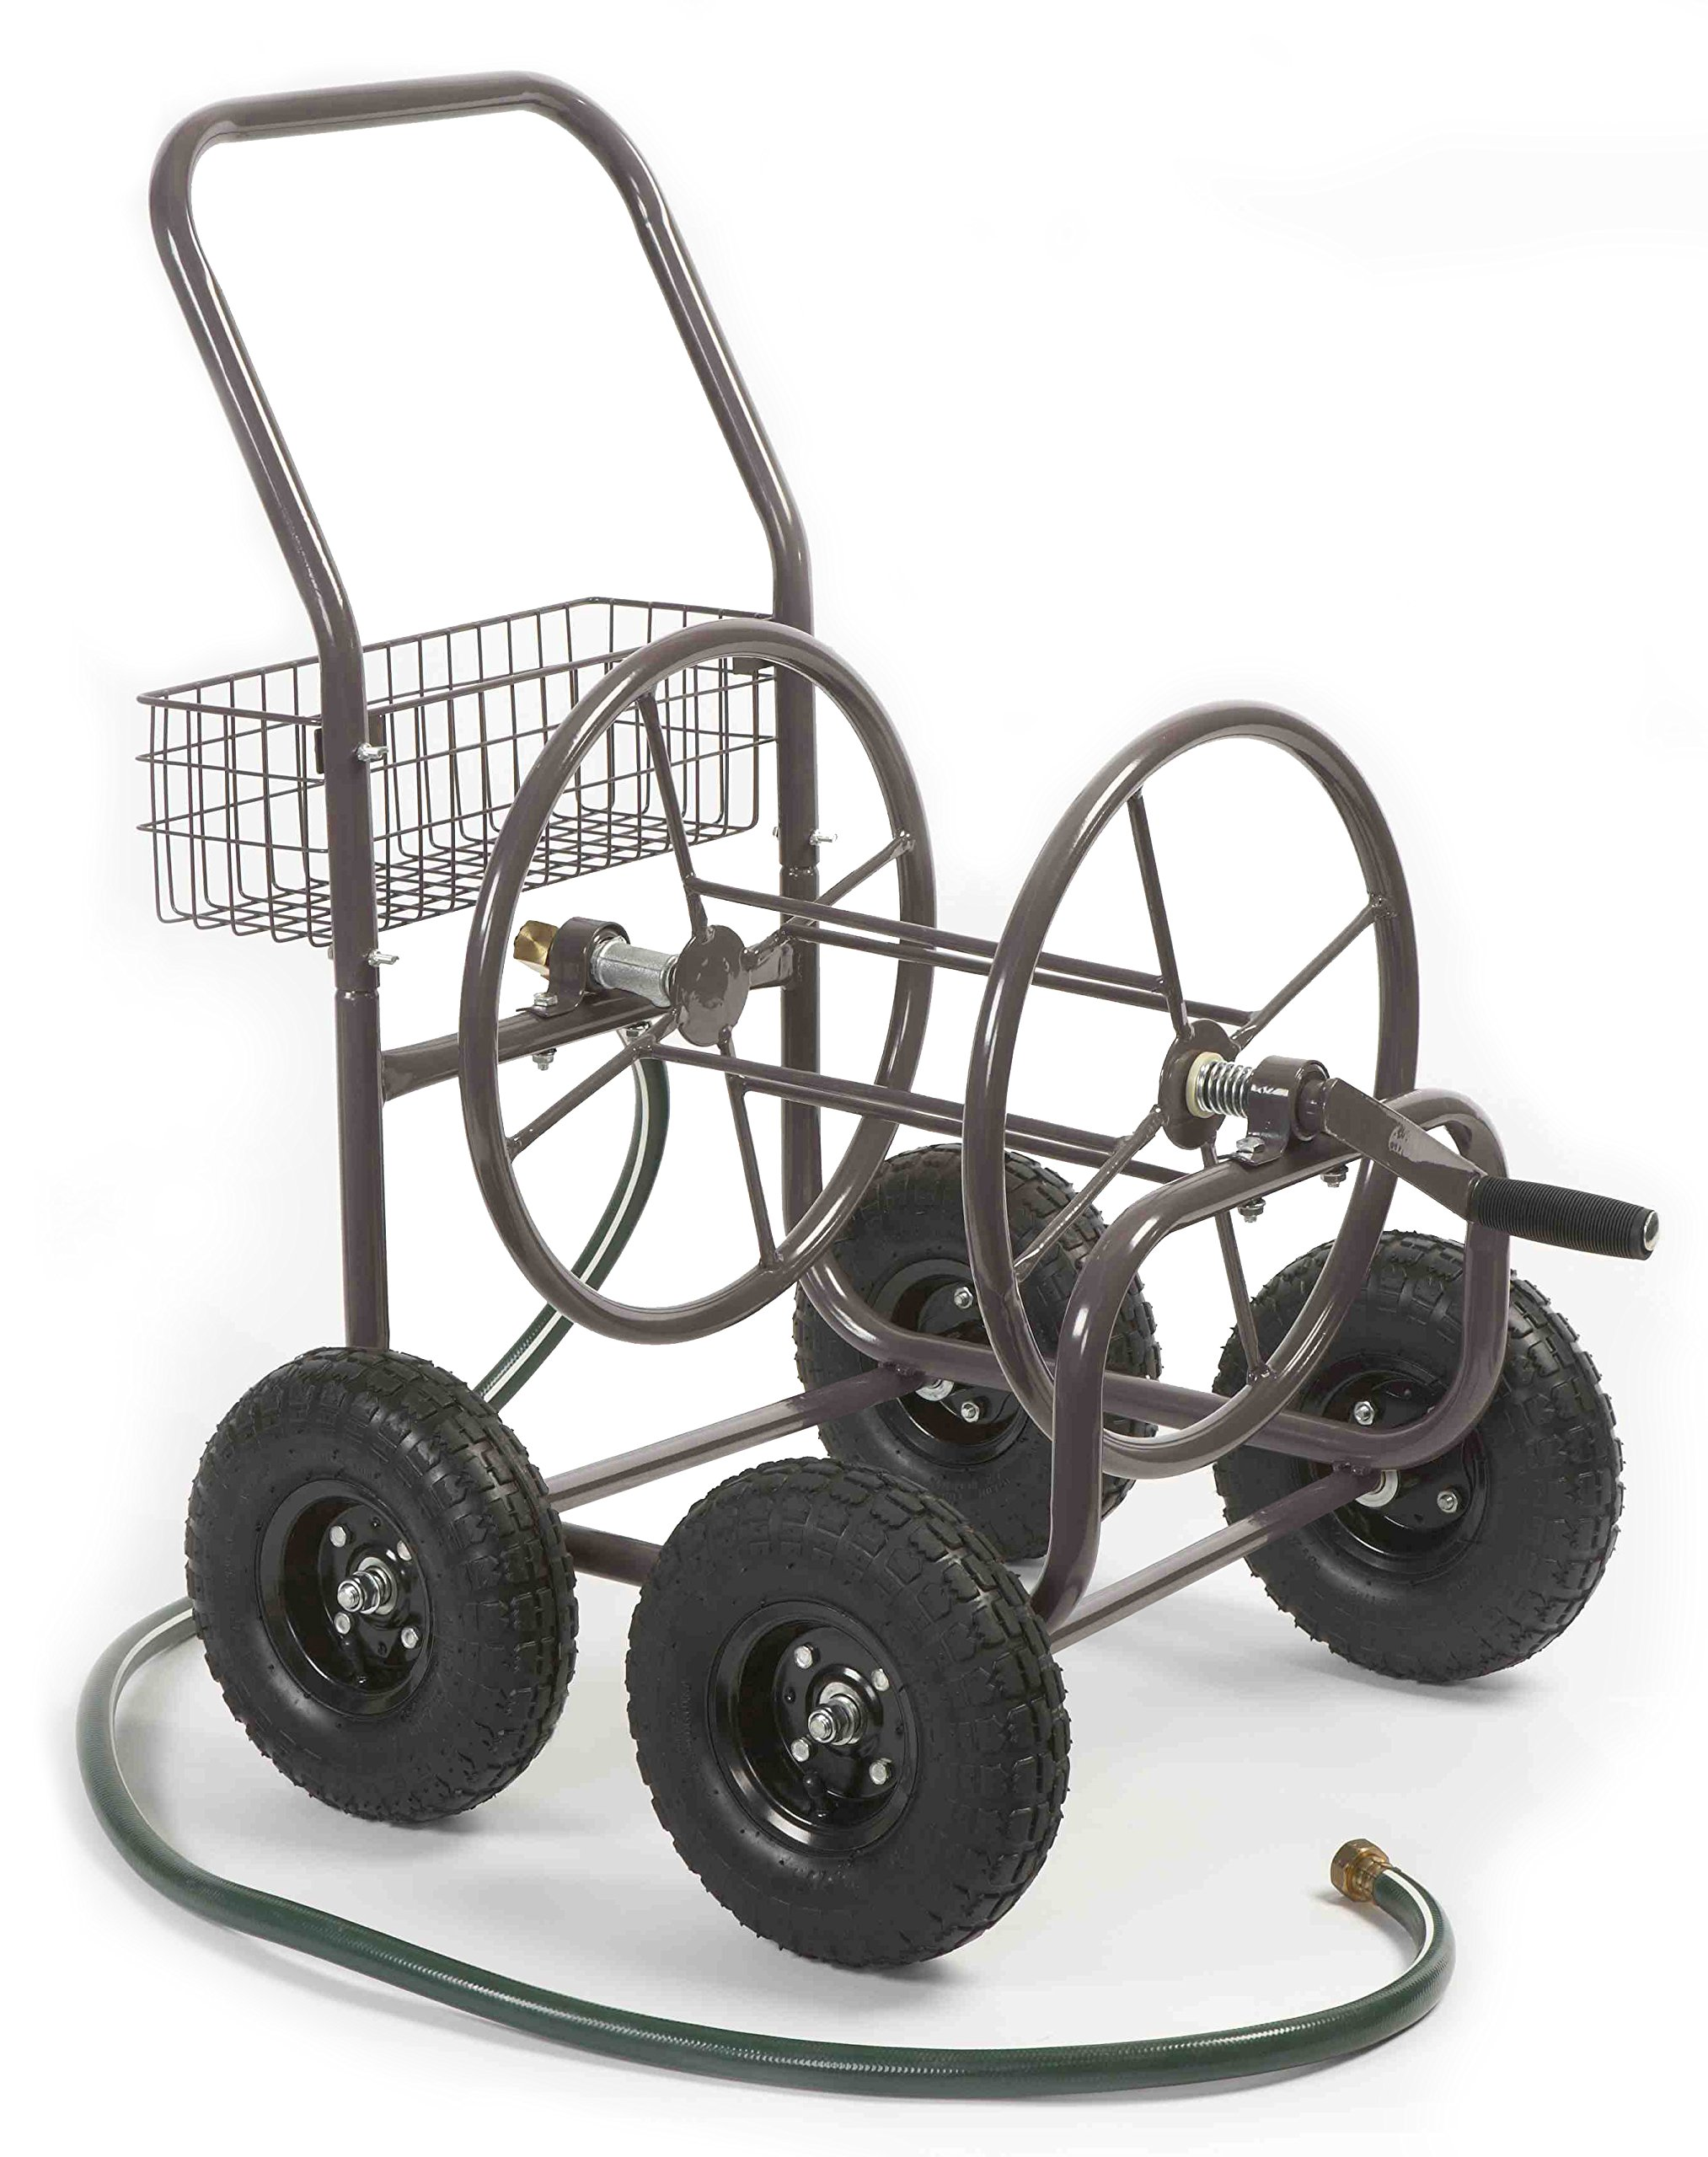 Liberty Garden Residential Grade 4 Wheel 871-M1-1 Garden Hose Reel Cart, Bronze by Liberty Garden Products